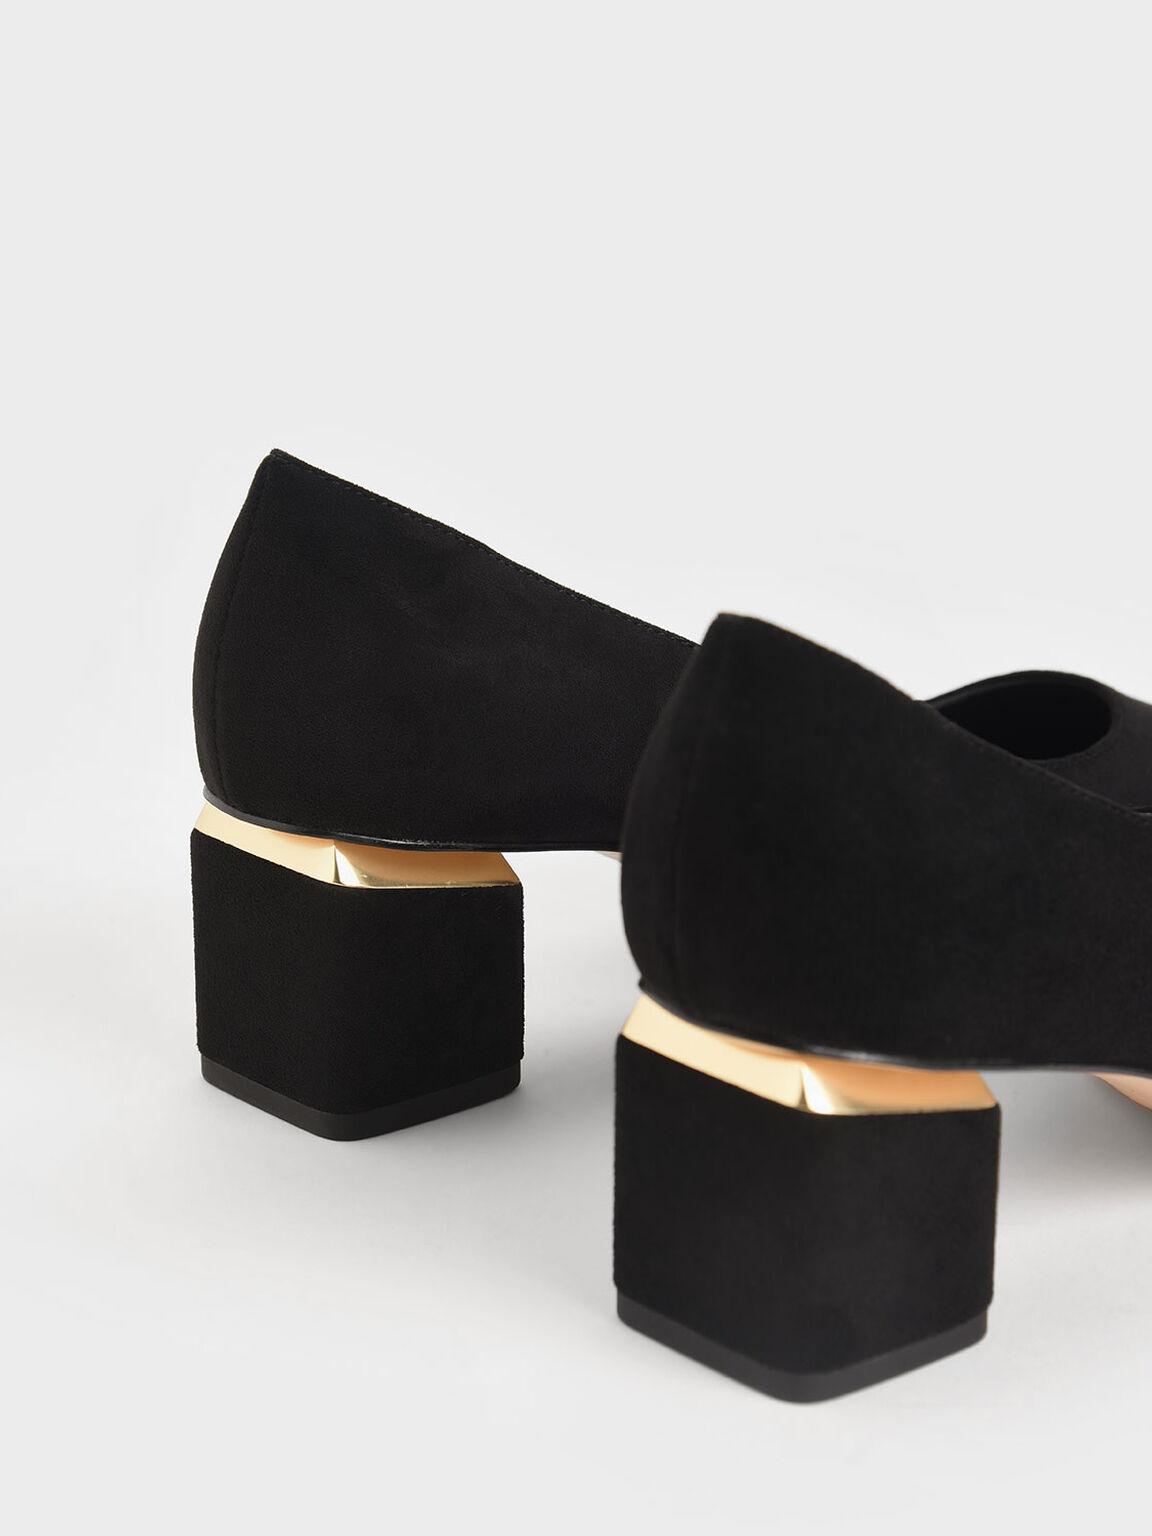 Textured Block Heel Pumps, Black Textured, hi-res